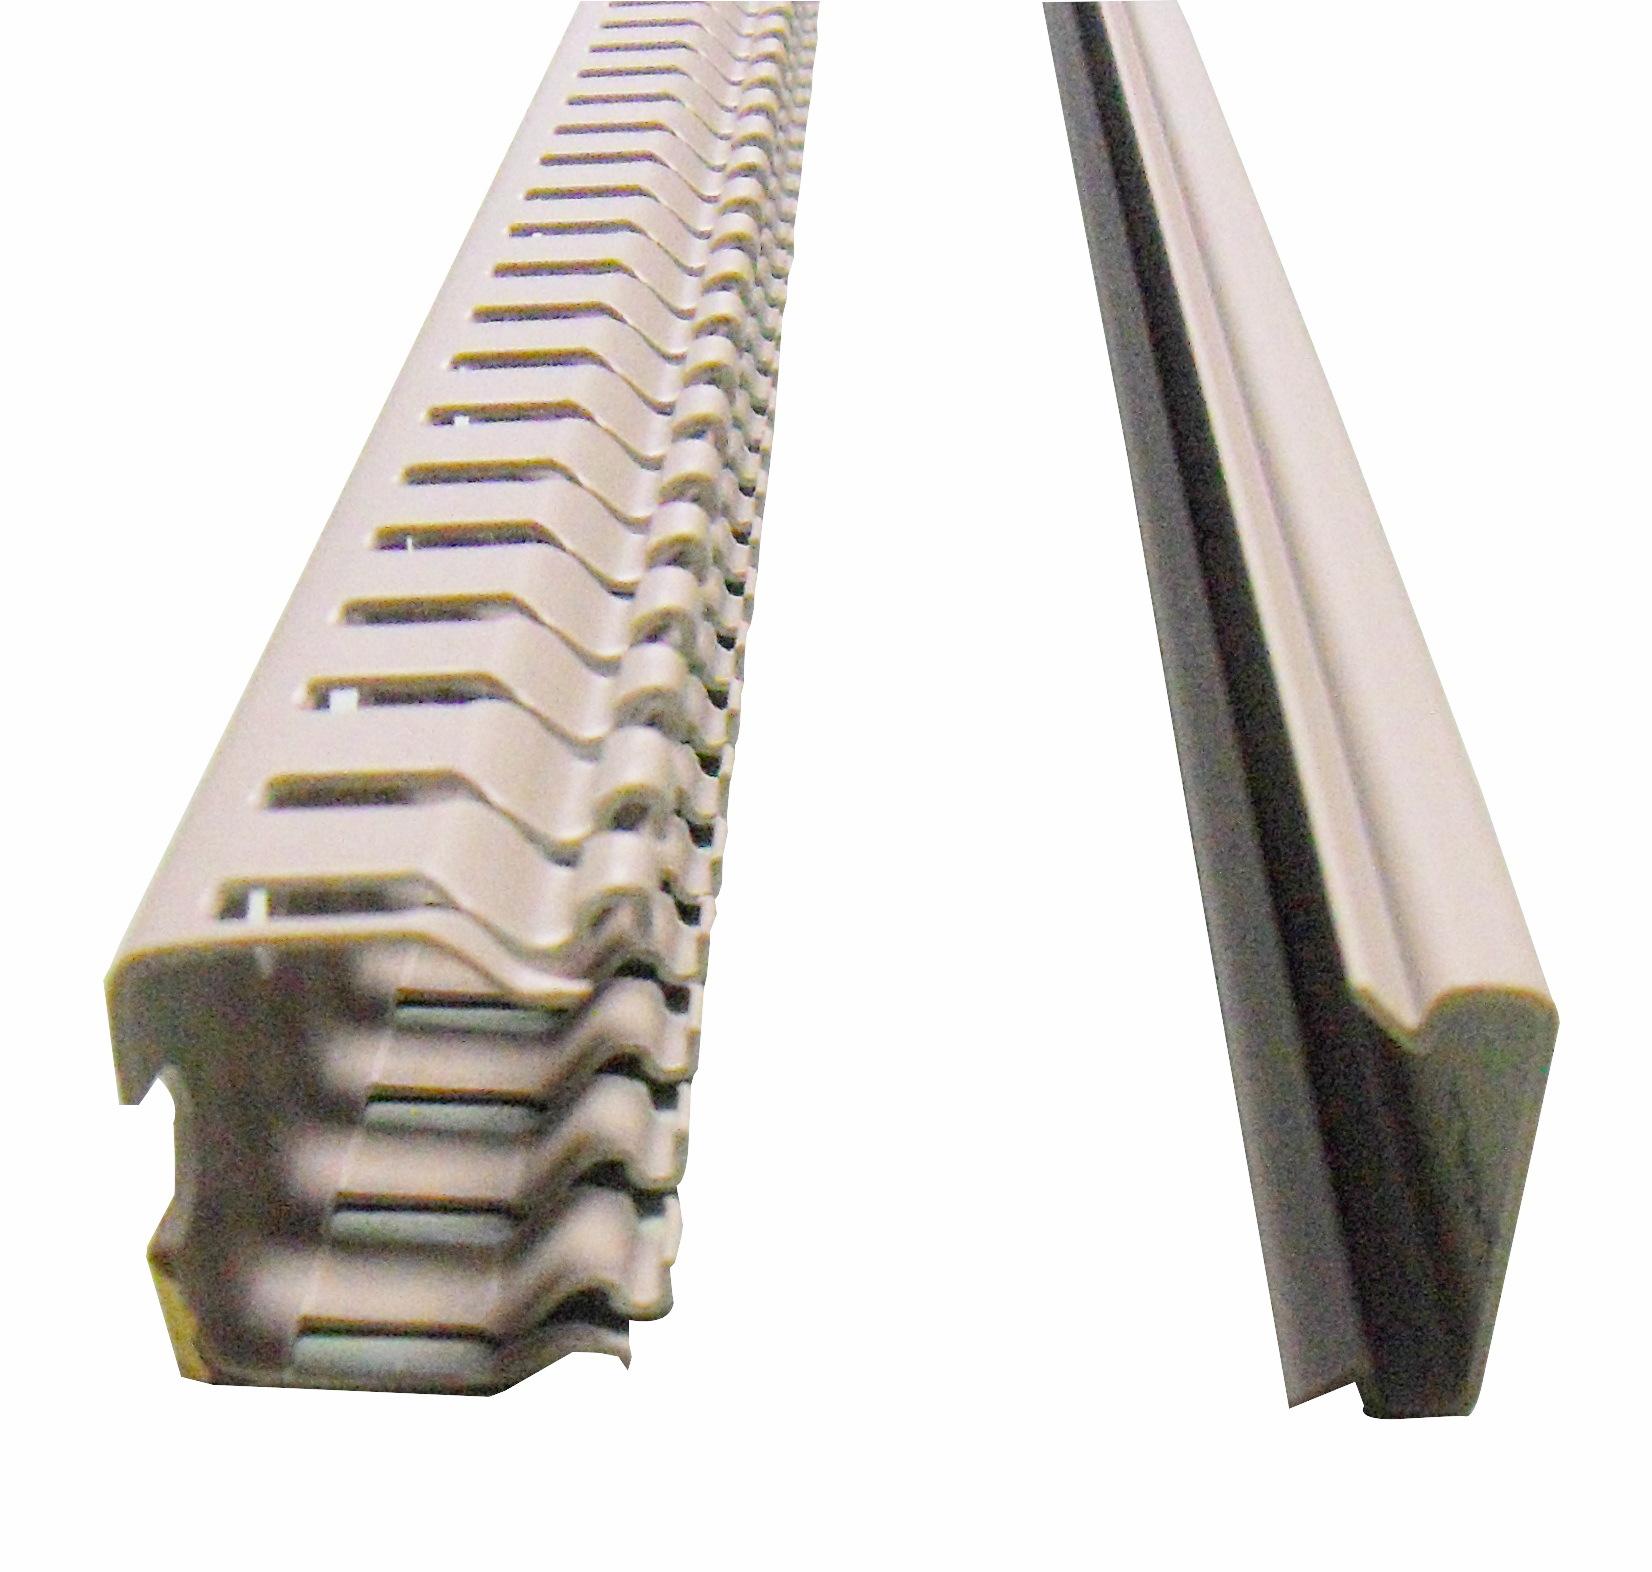 1 m Verdrahtungskanal Type BE 25x25mm (BxH), RAL 7030 RH724243--